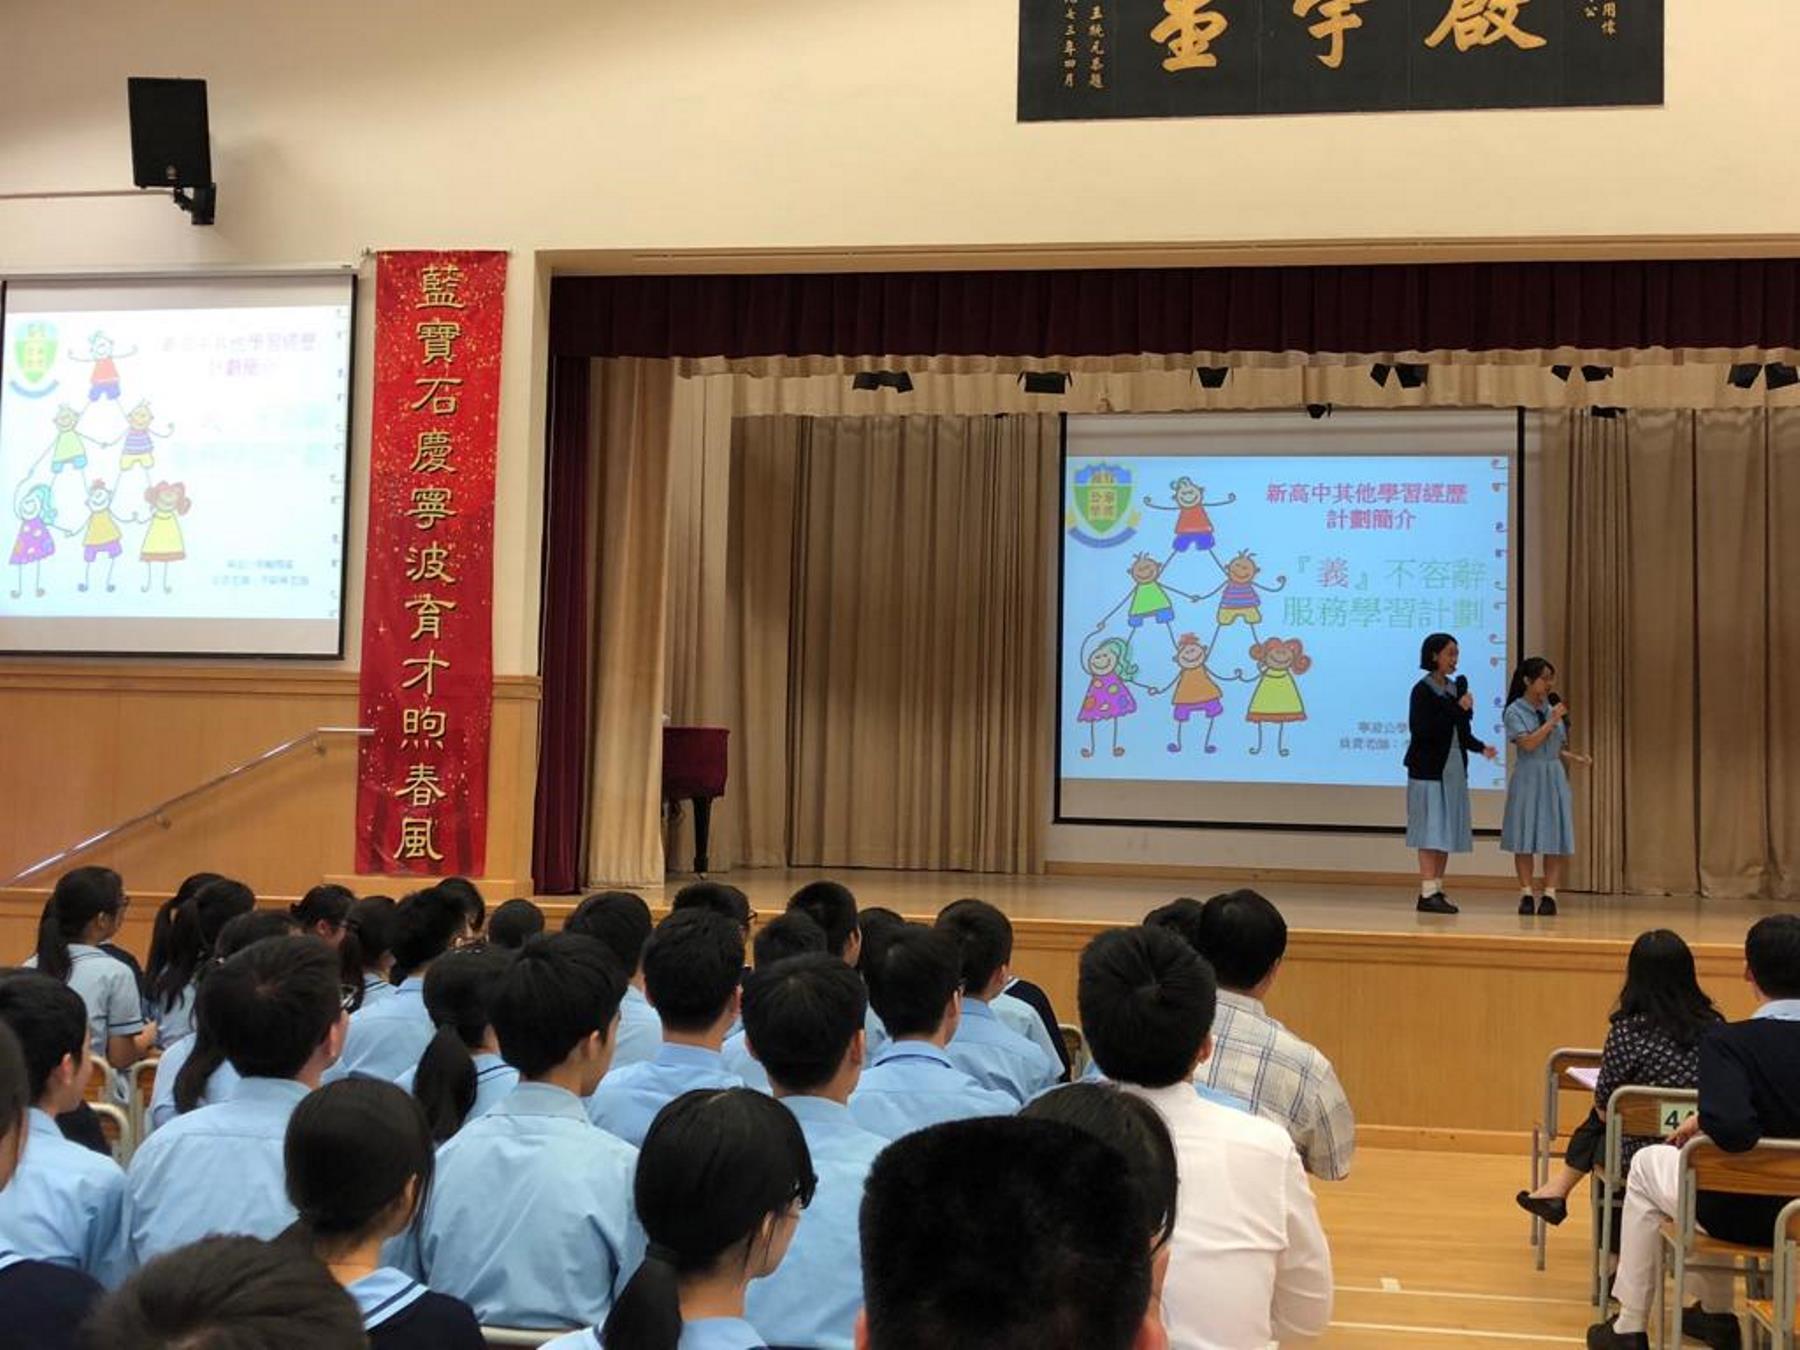 http://npc.edu.hk/sites/default/files/3_21.jpeg